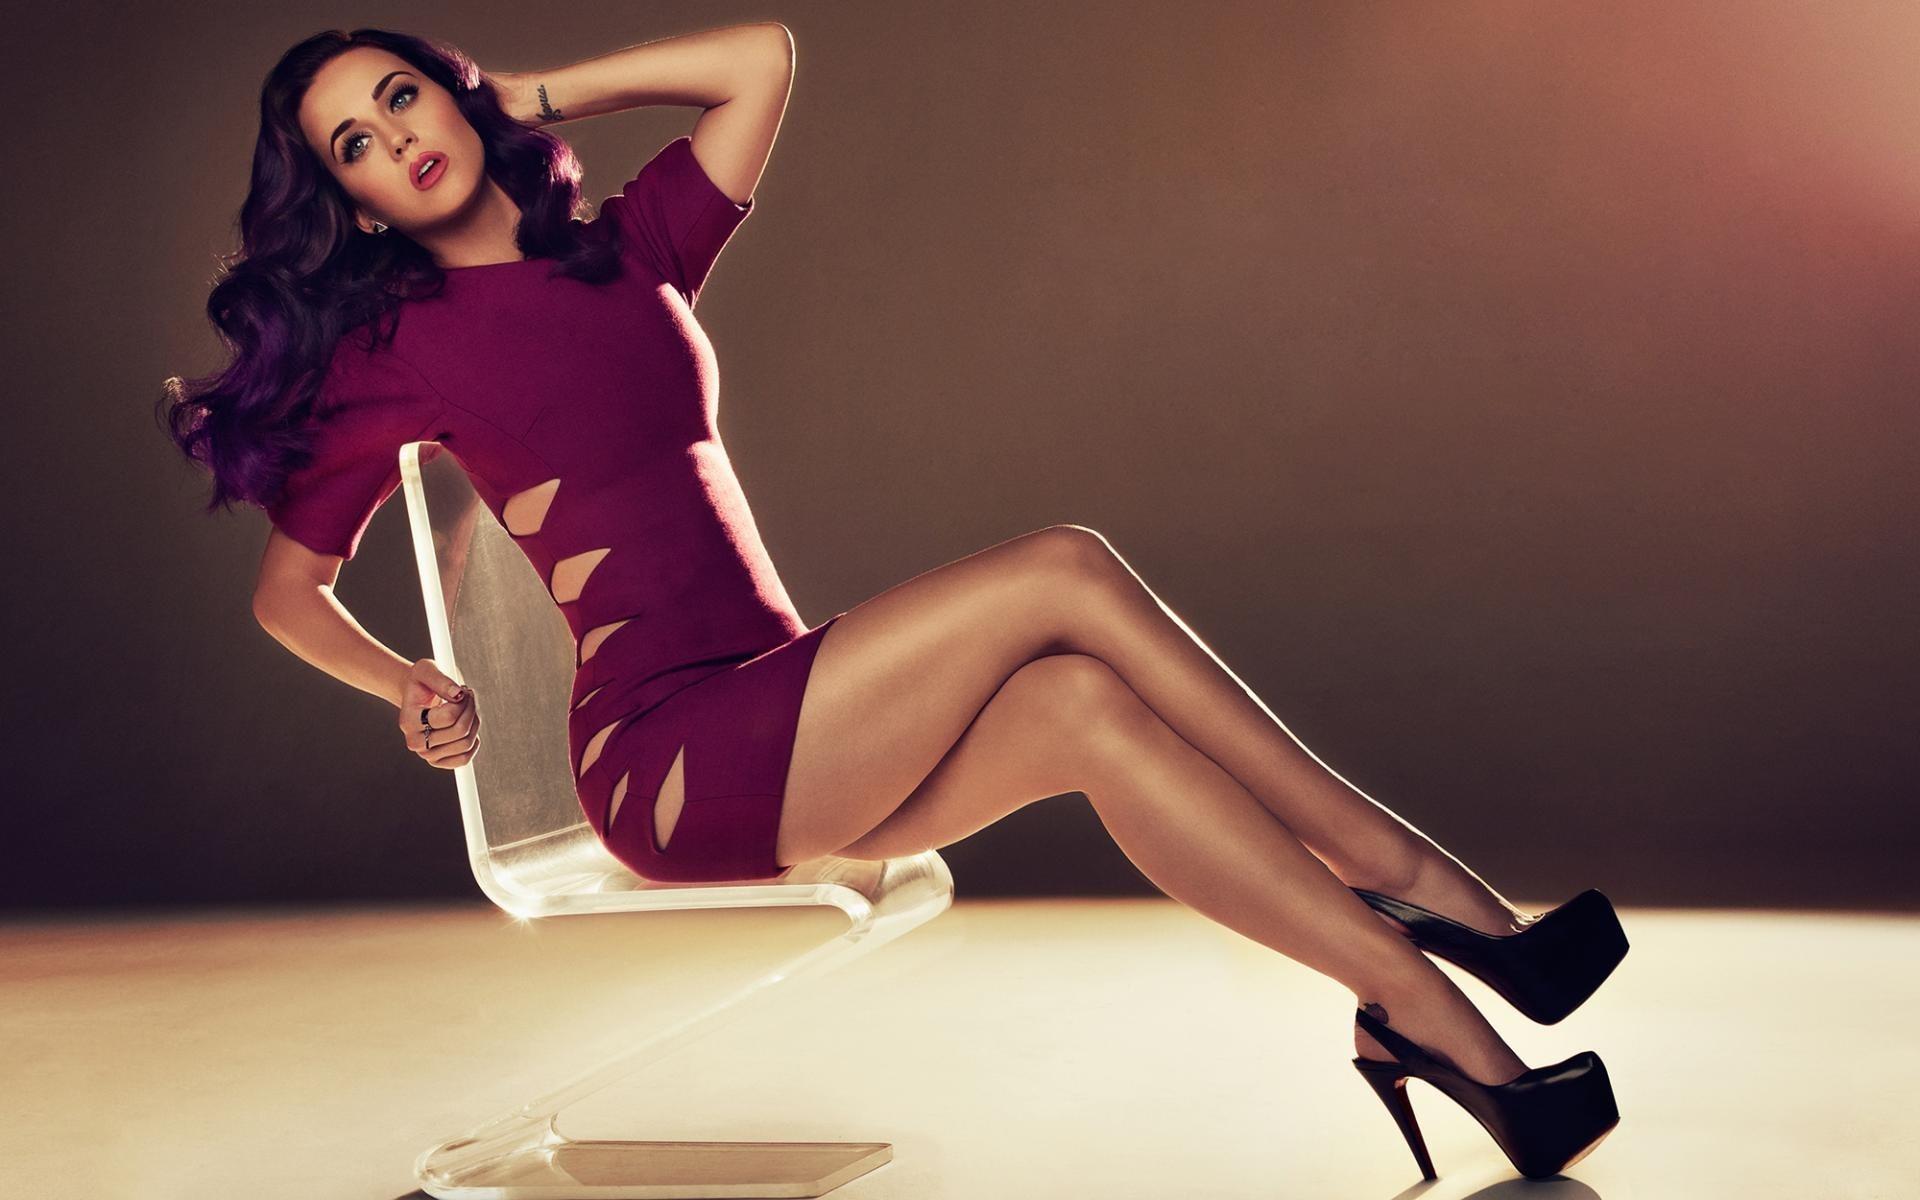 Beauty Katy Perry Singer Girl Music